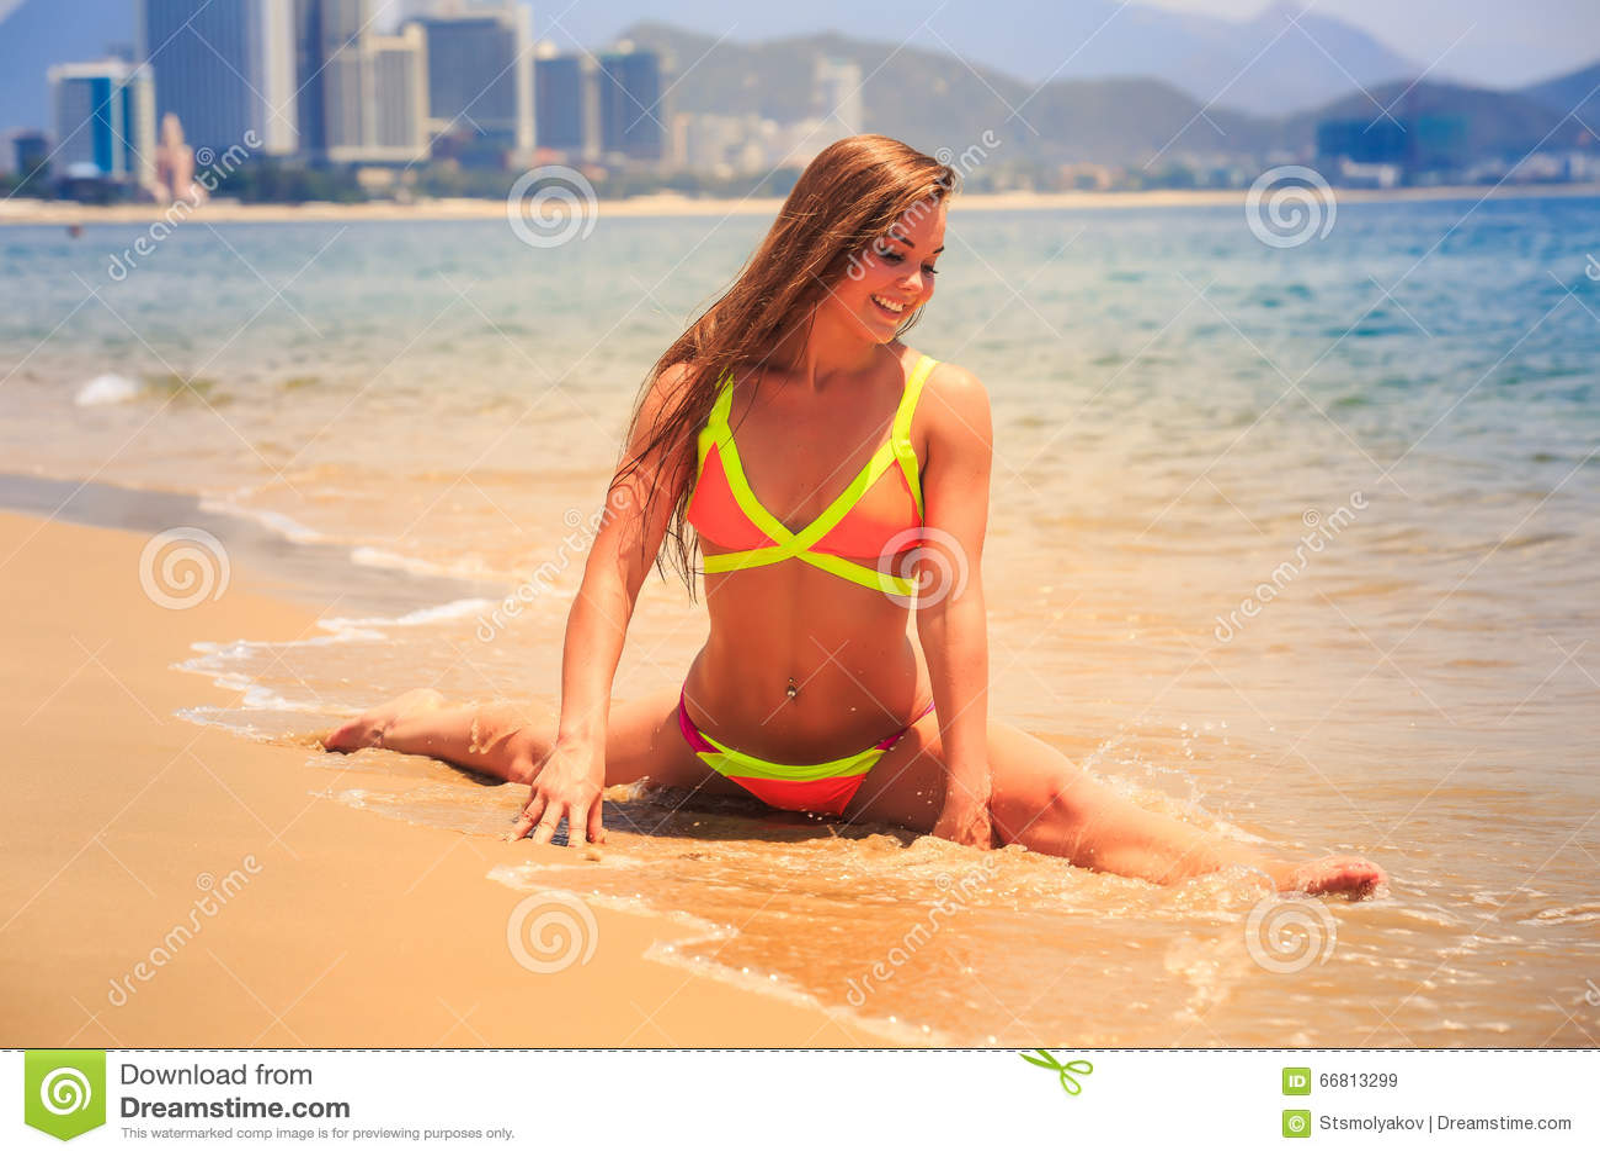 Bikini girl makes a boner explode 2